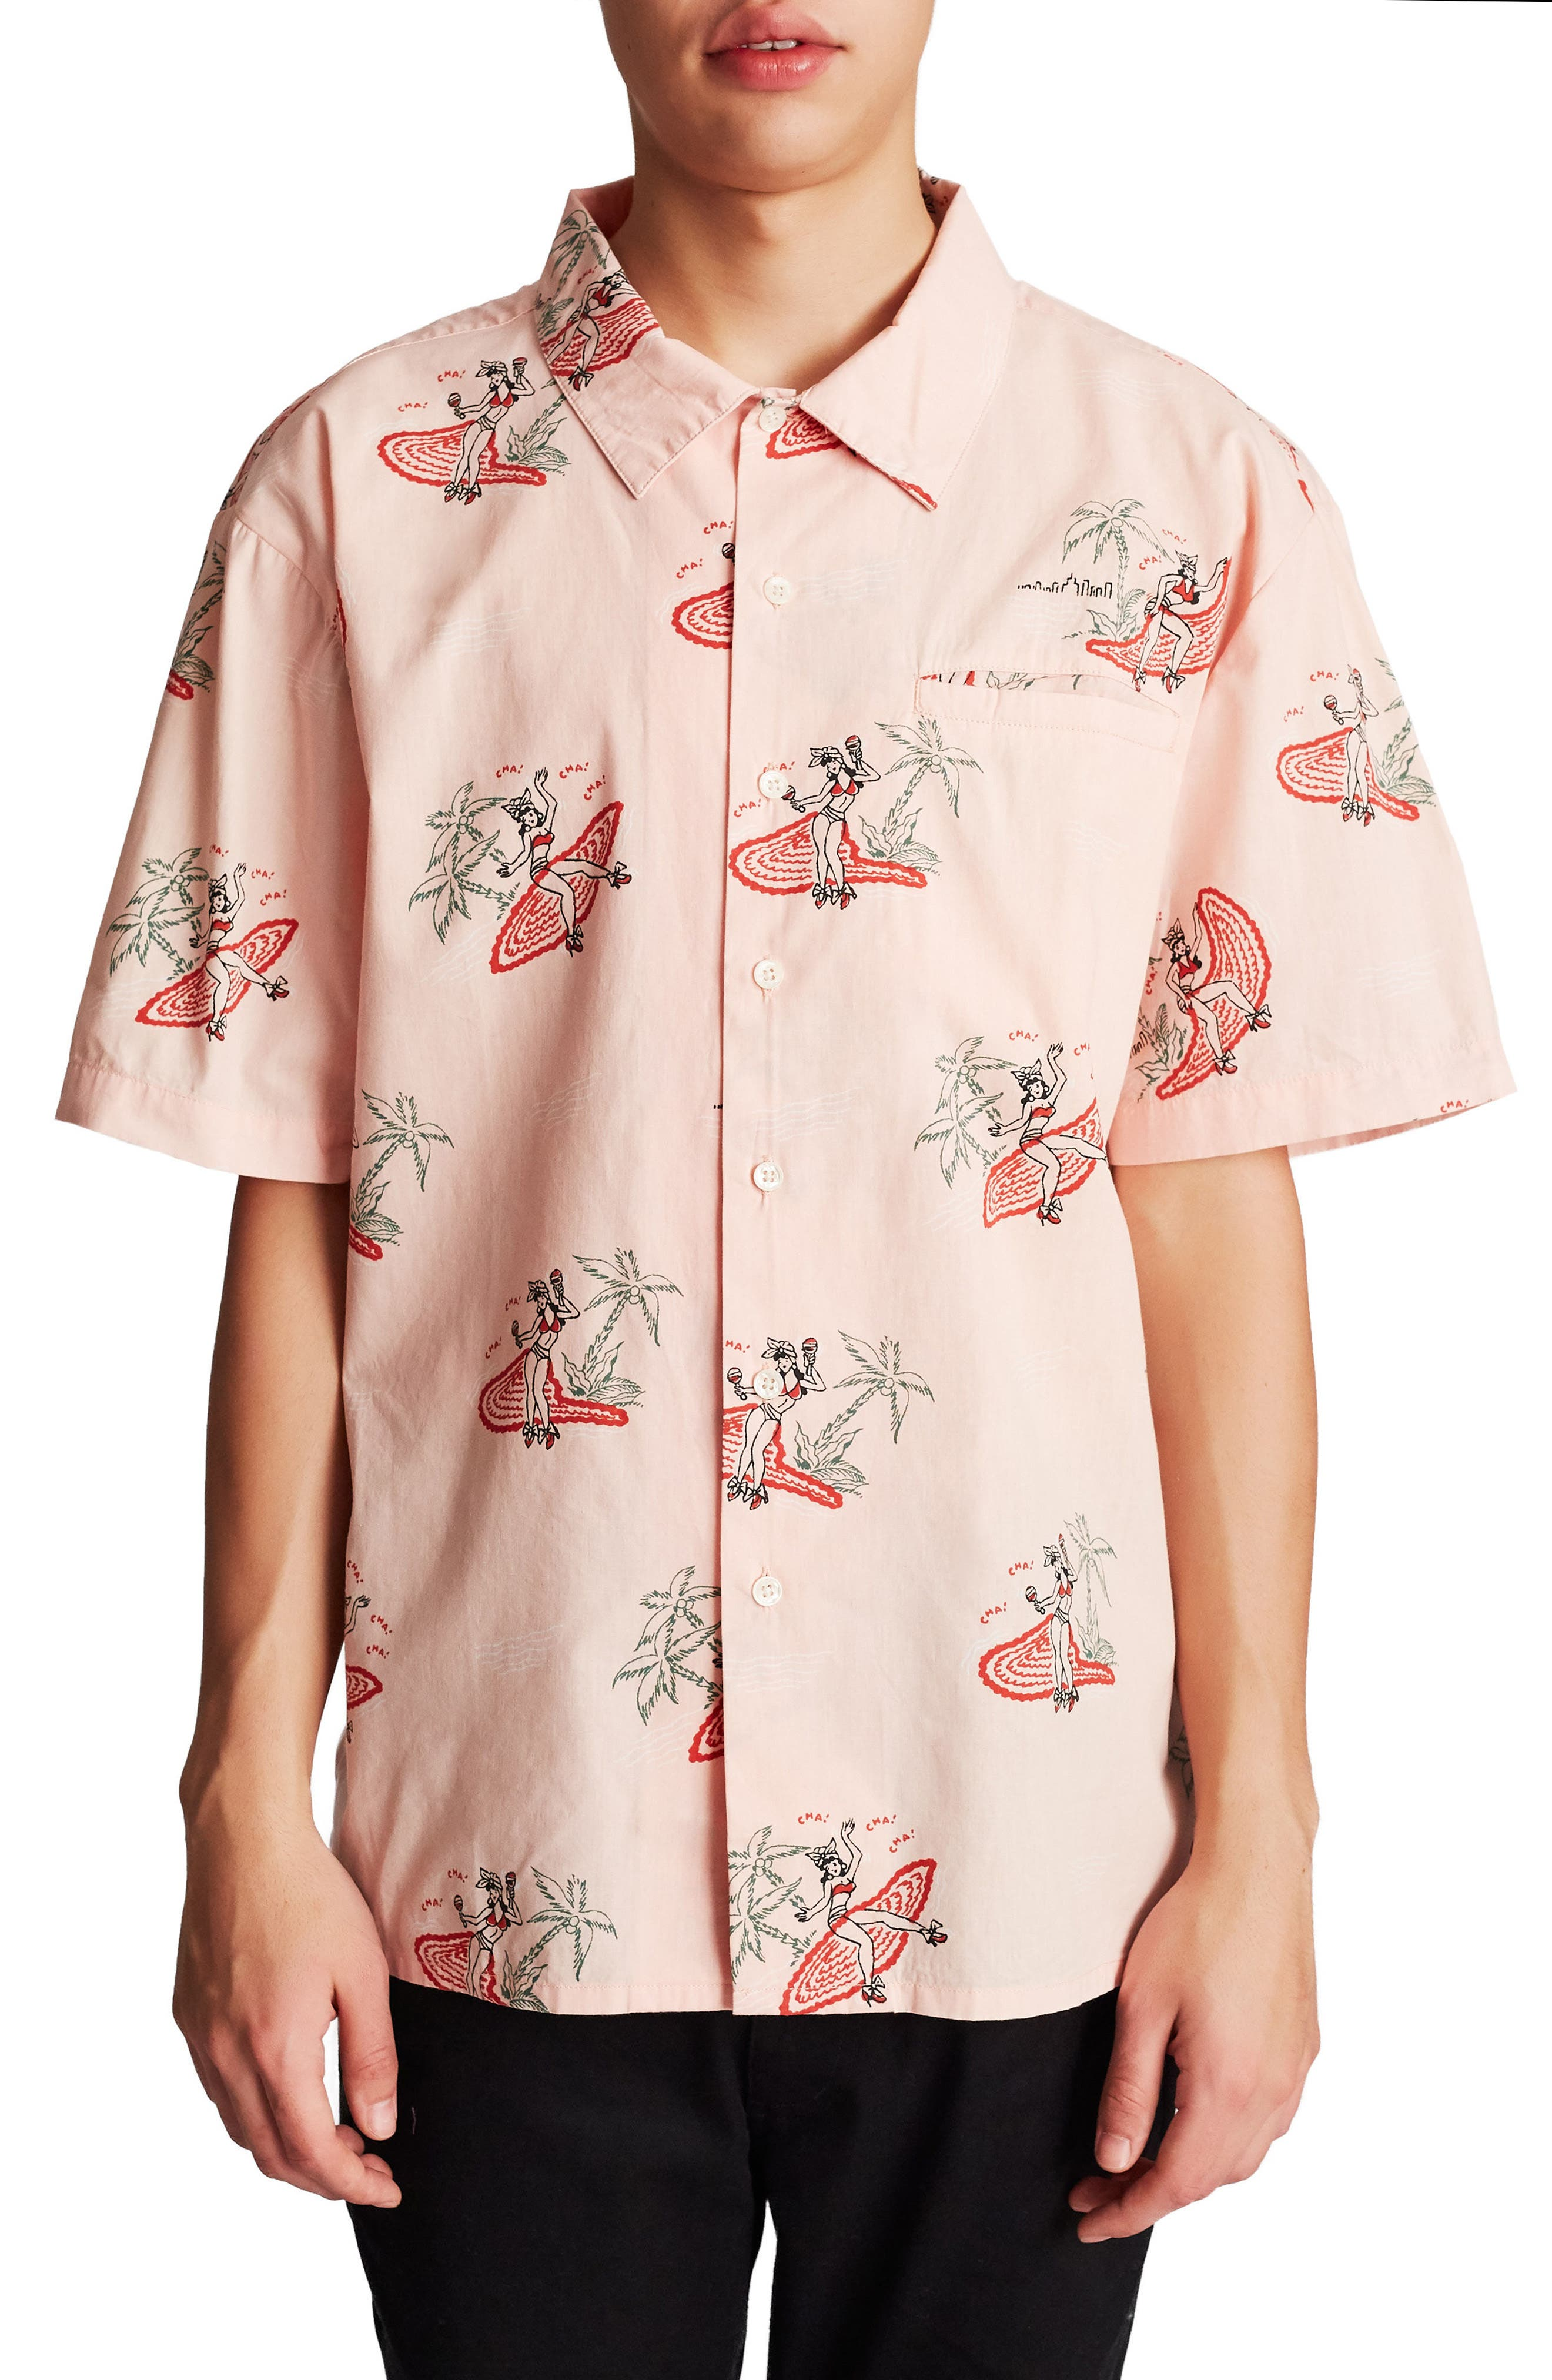 Bueller Woven Shirt,                             Main thumbnail 1, color,                             650